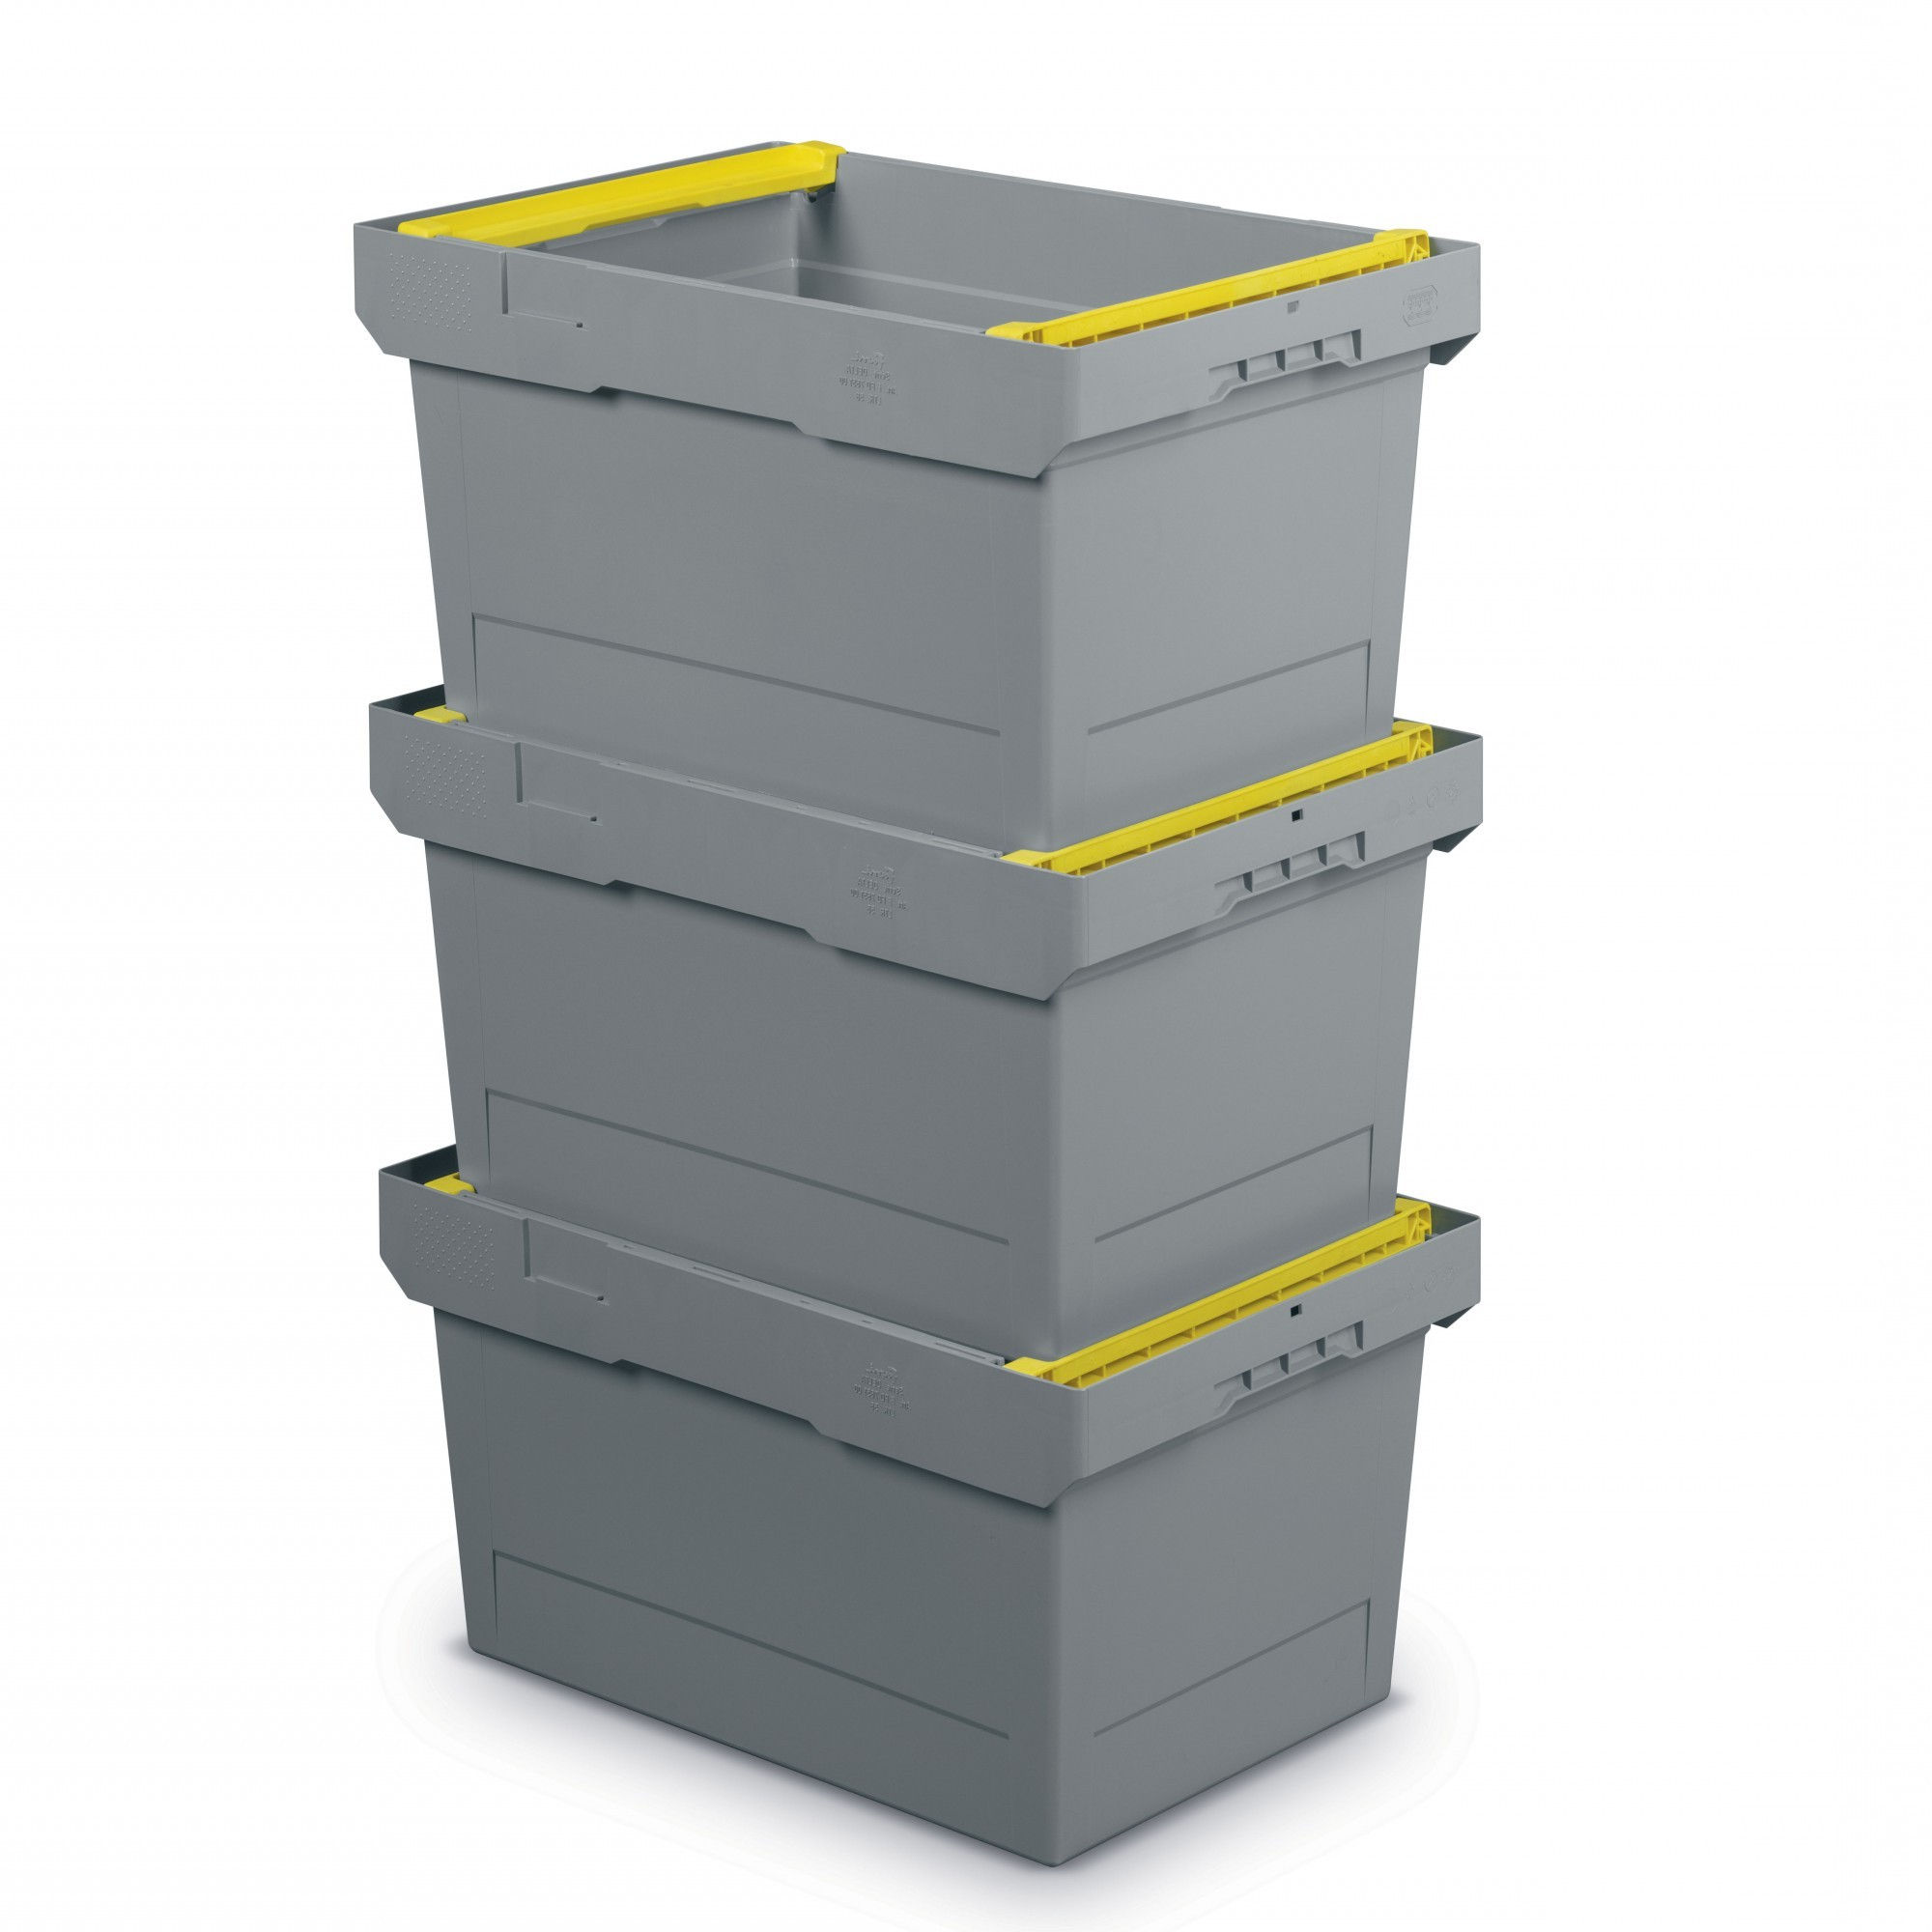 Cajas de pl stico apilables delta - Cajas de plastico ...